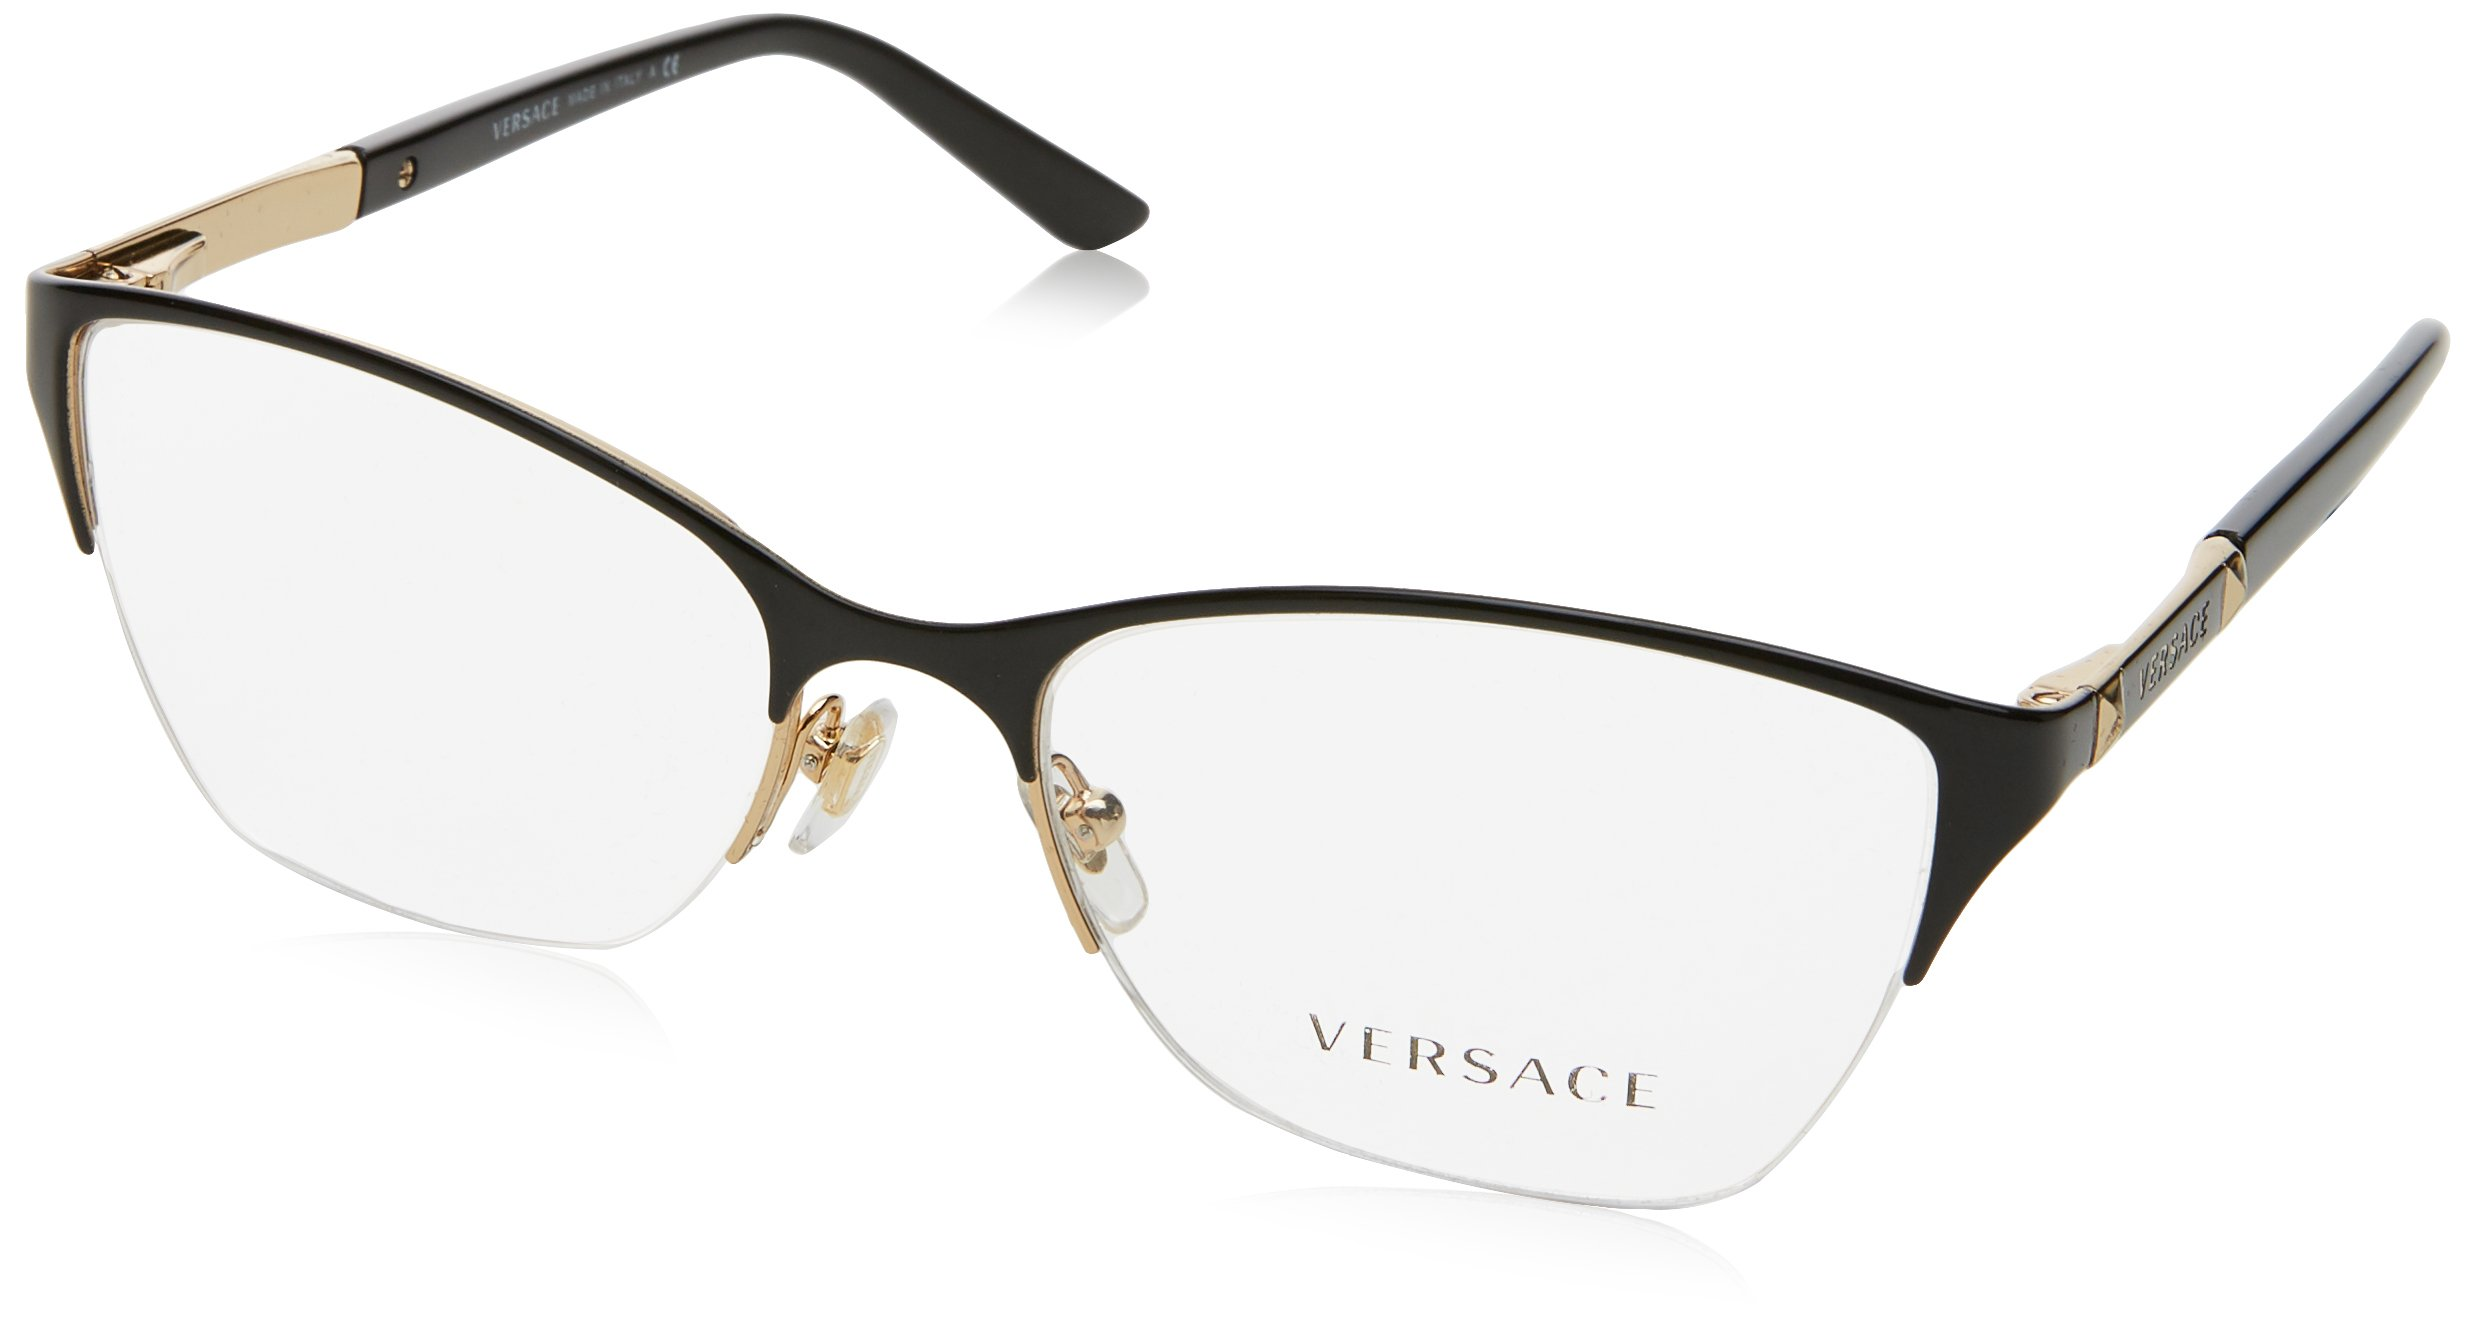 Versace VE1218 Eyeglass Frames 1342-53 - Gold VE1218-1342-53